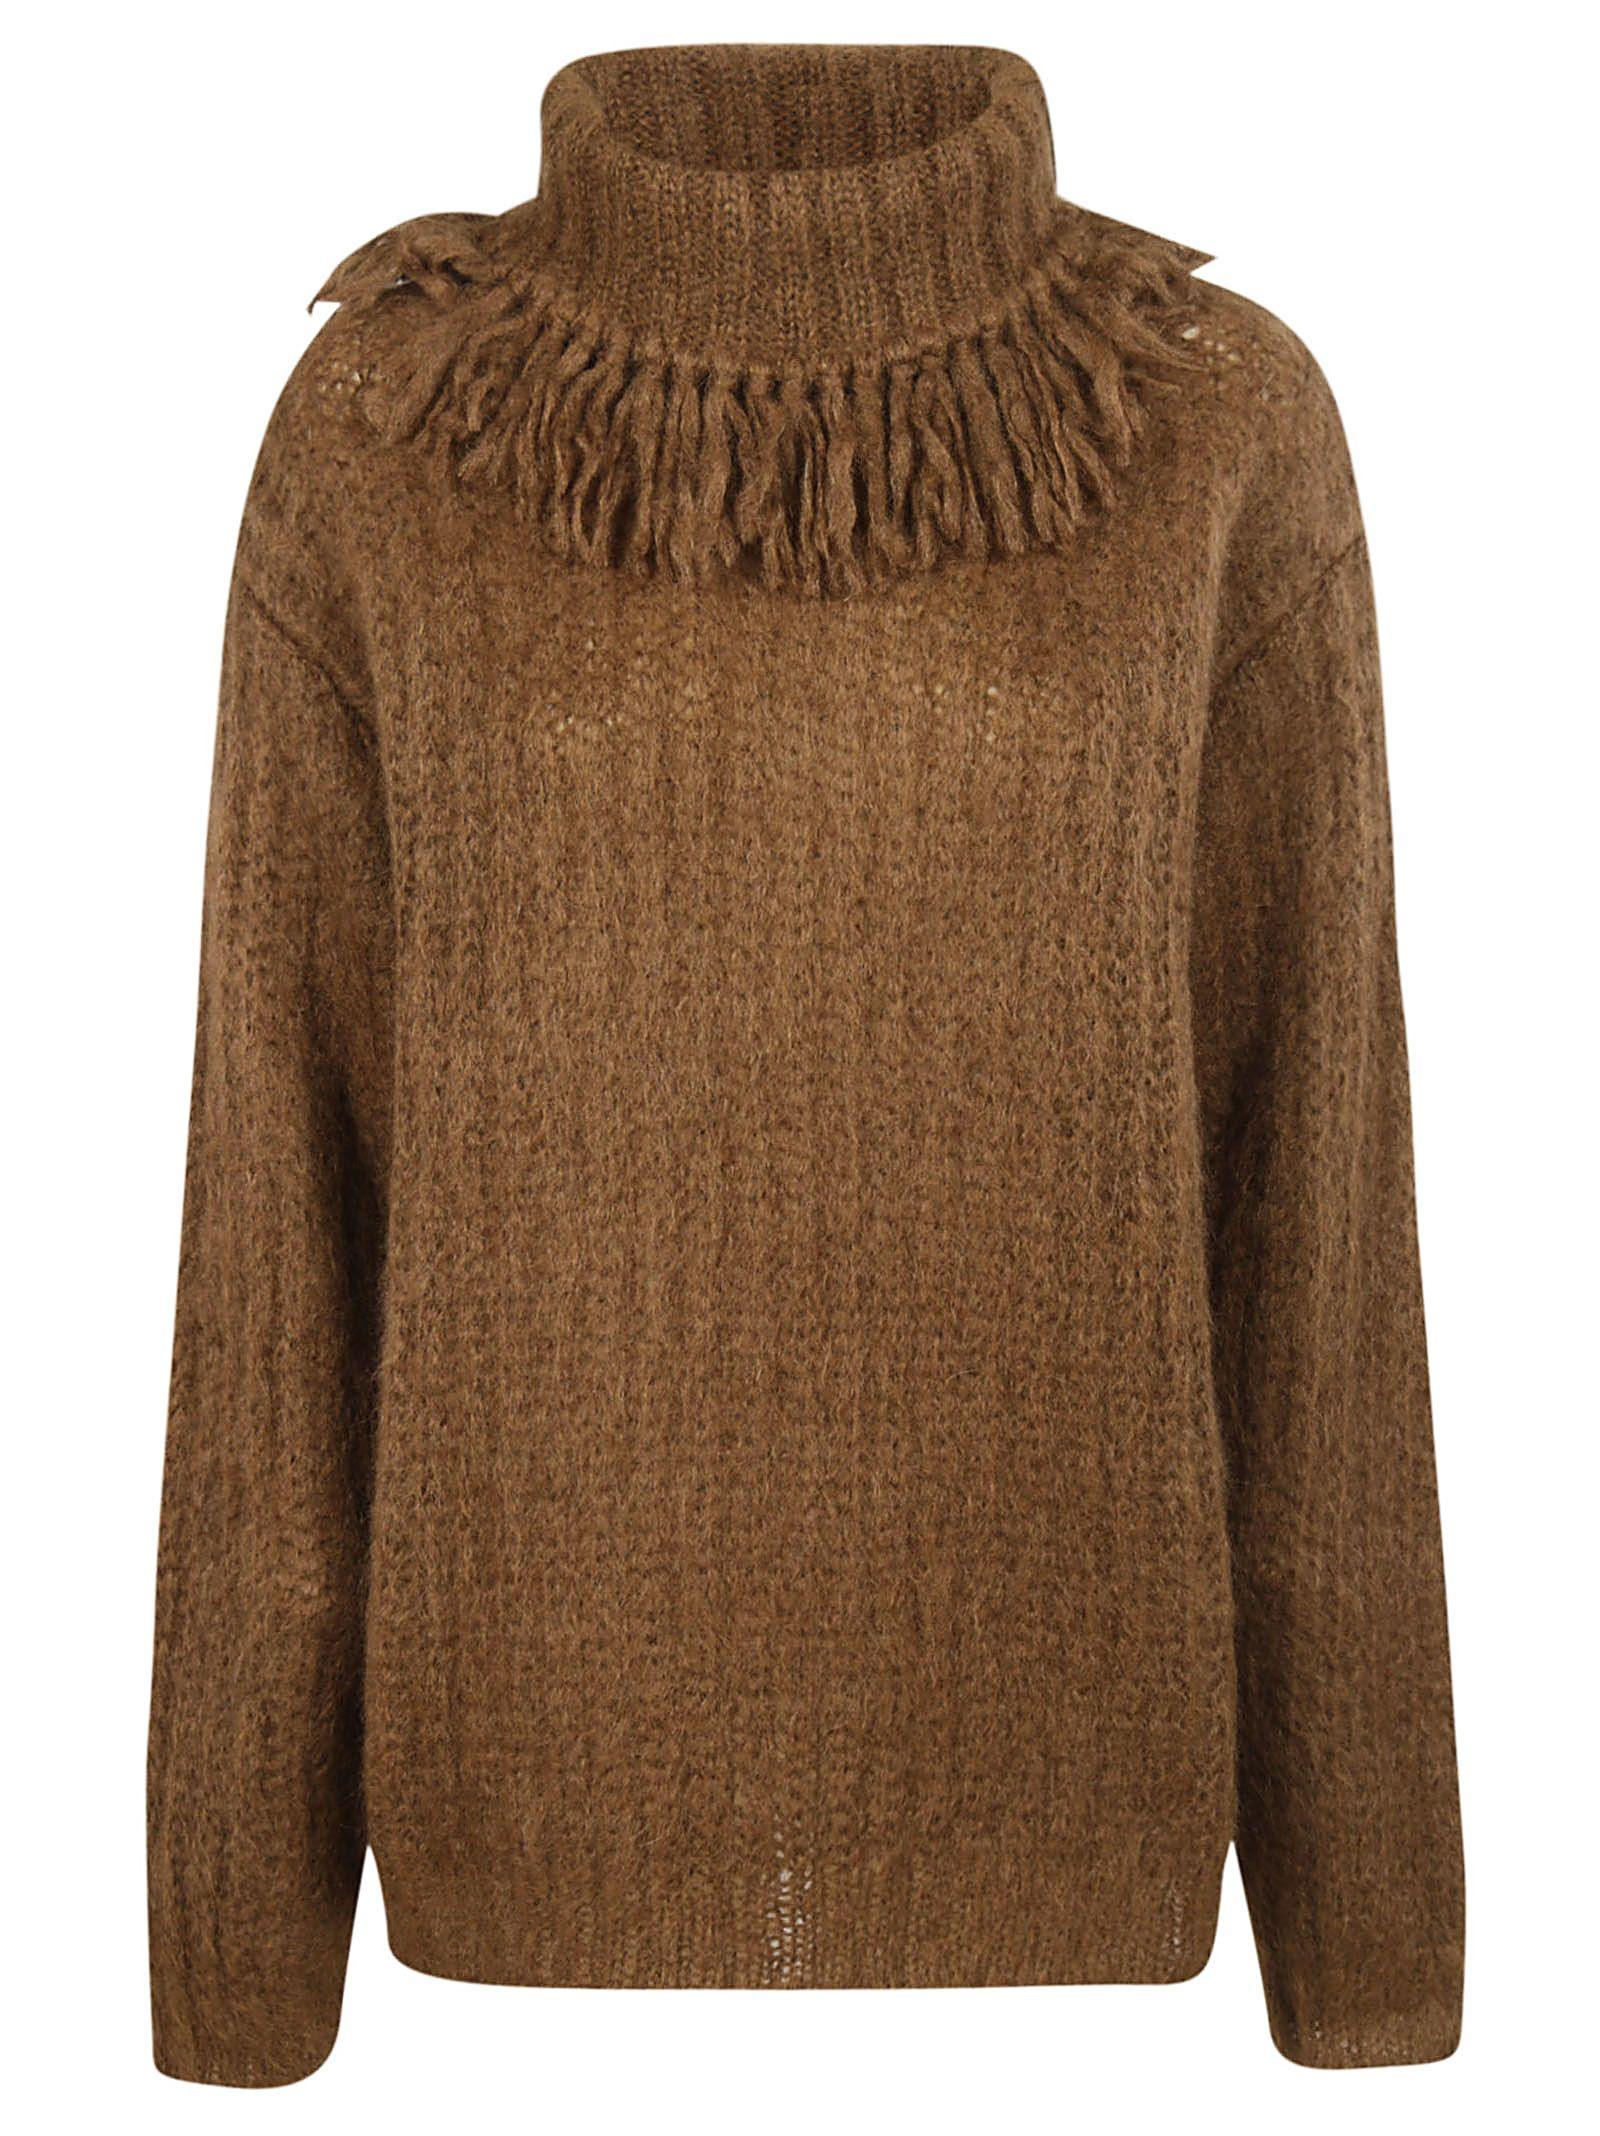 6bc9cb95e28 Miu Miu Miu Miu Turtleneck Sweater - Brown - 10702703